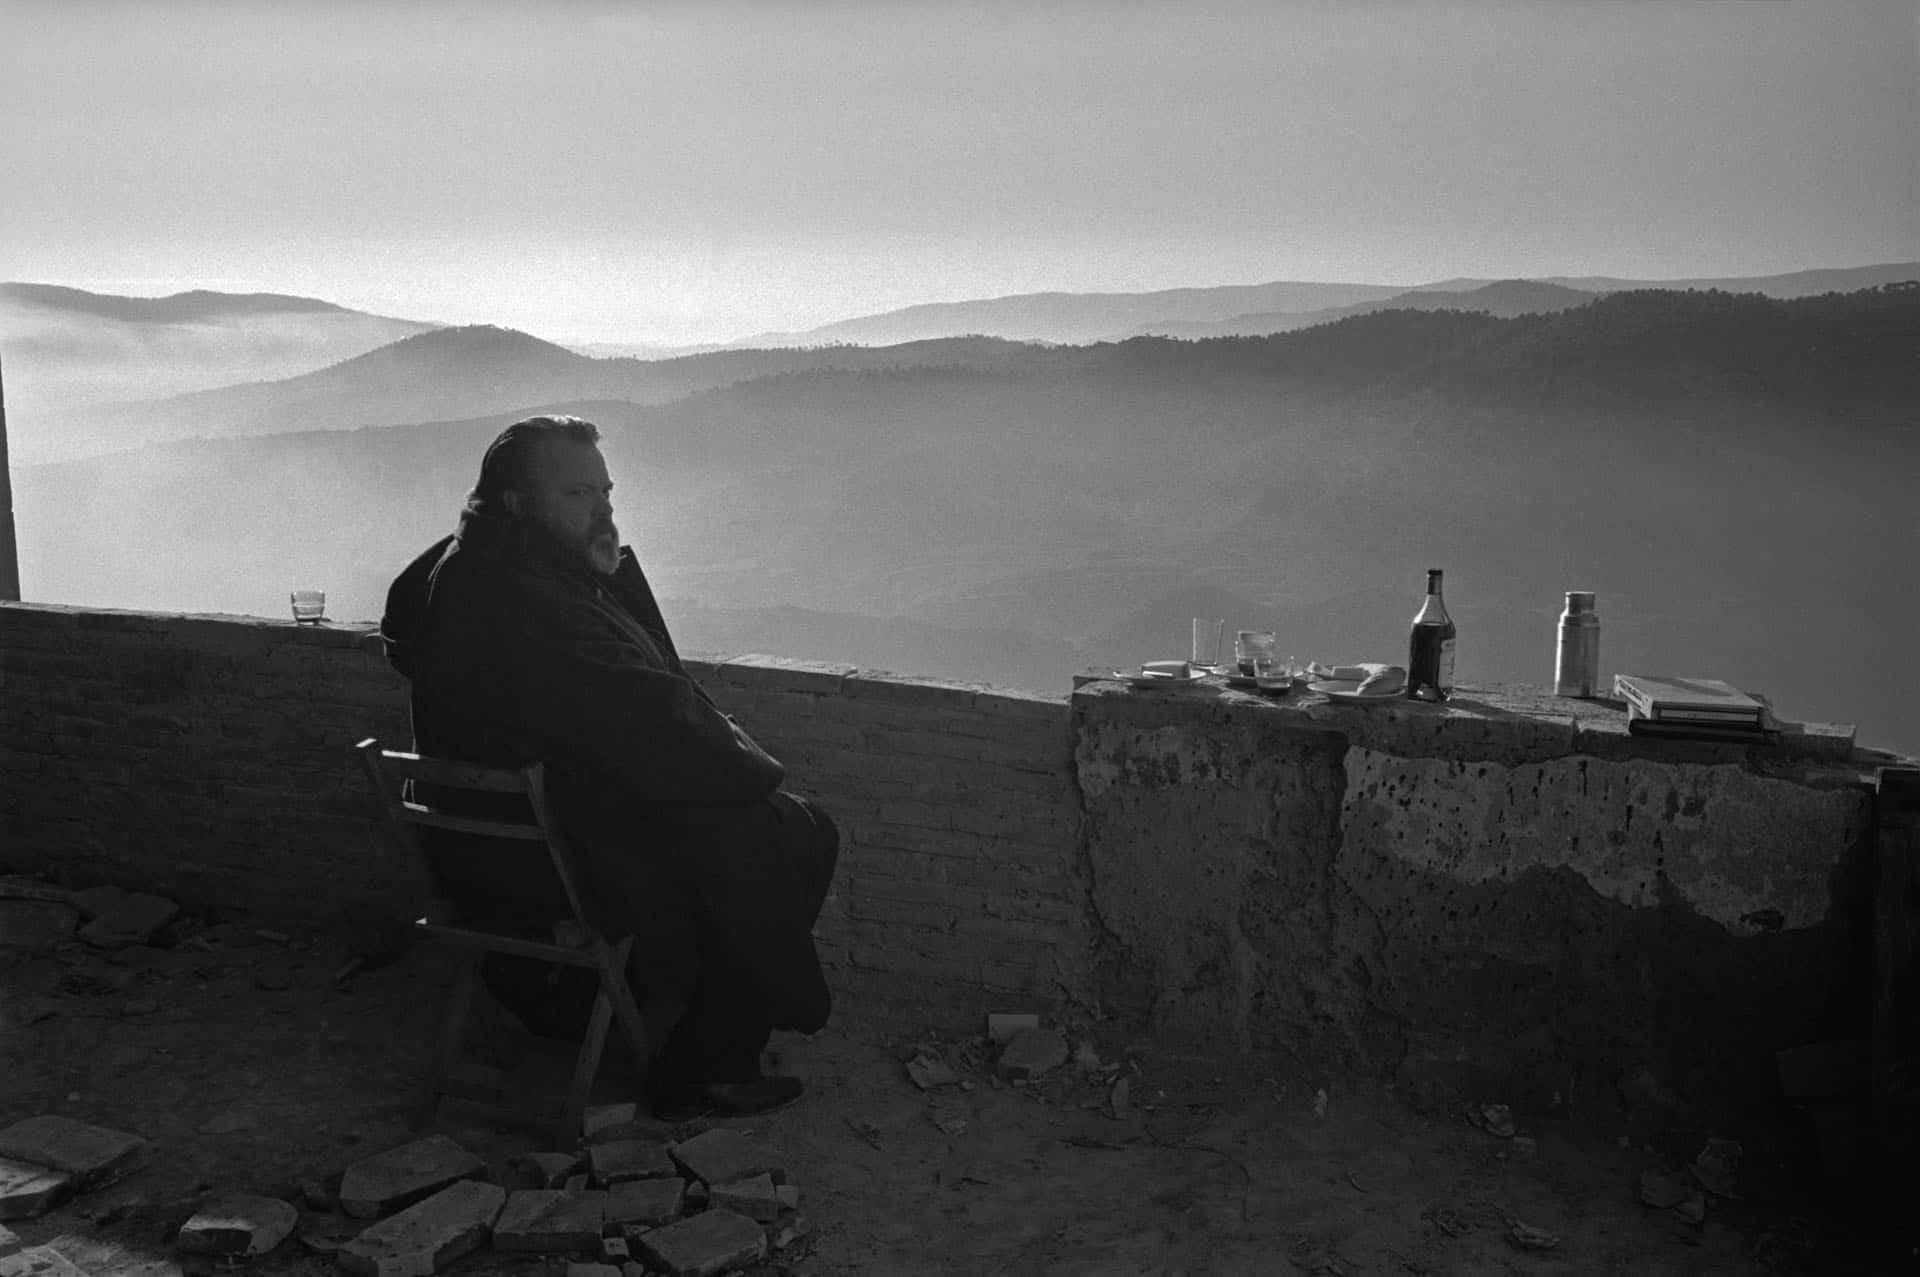 Lo Sguardo di Orson Welles: un momento del documentario